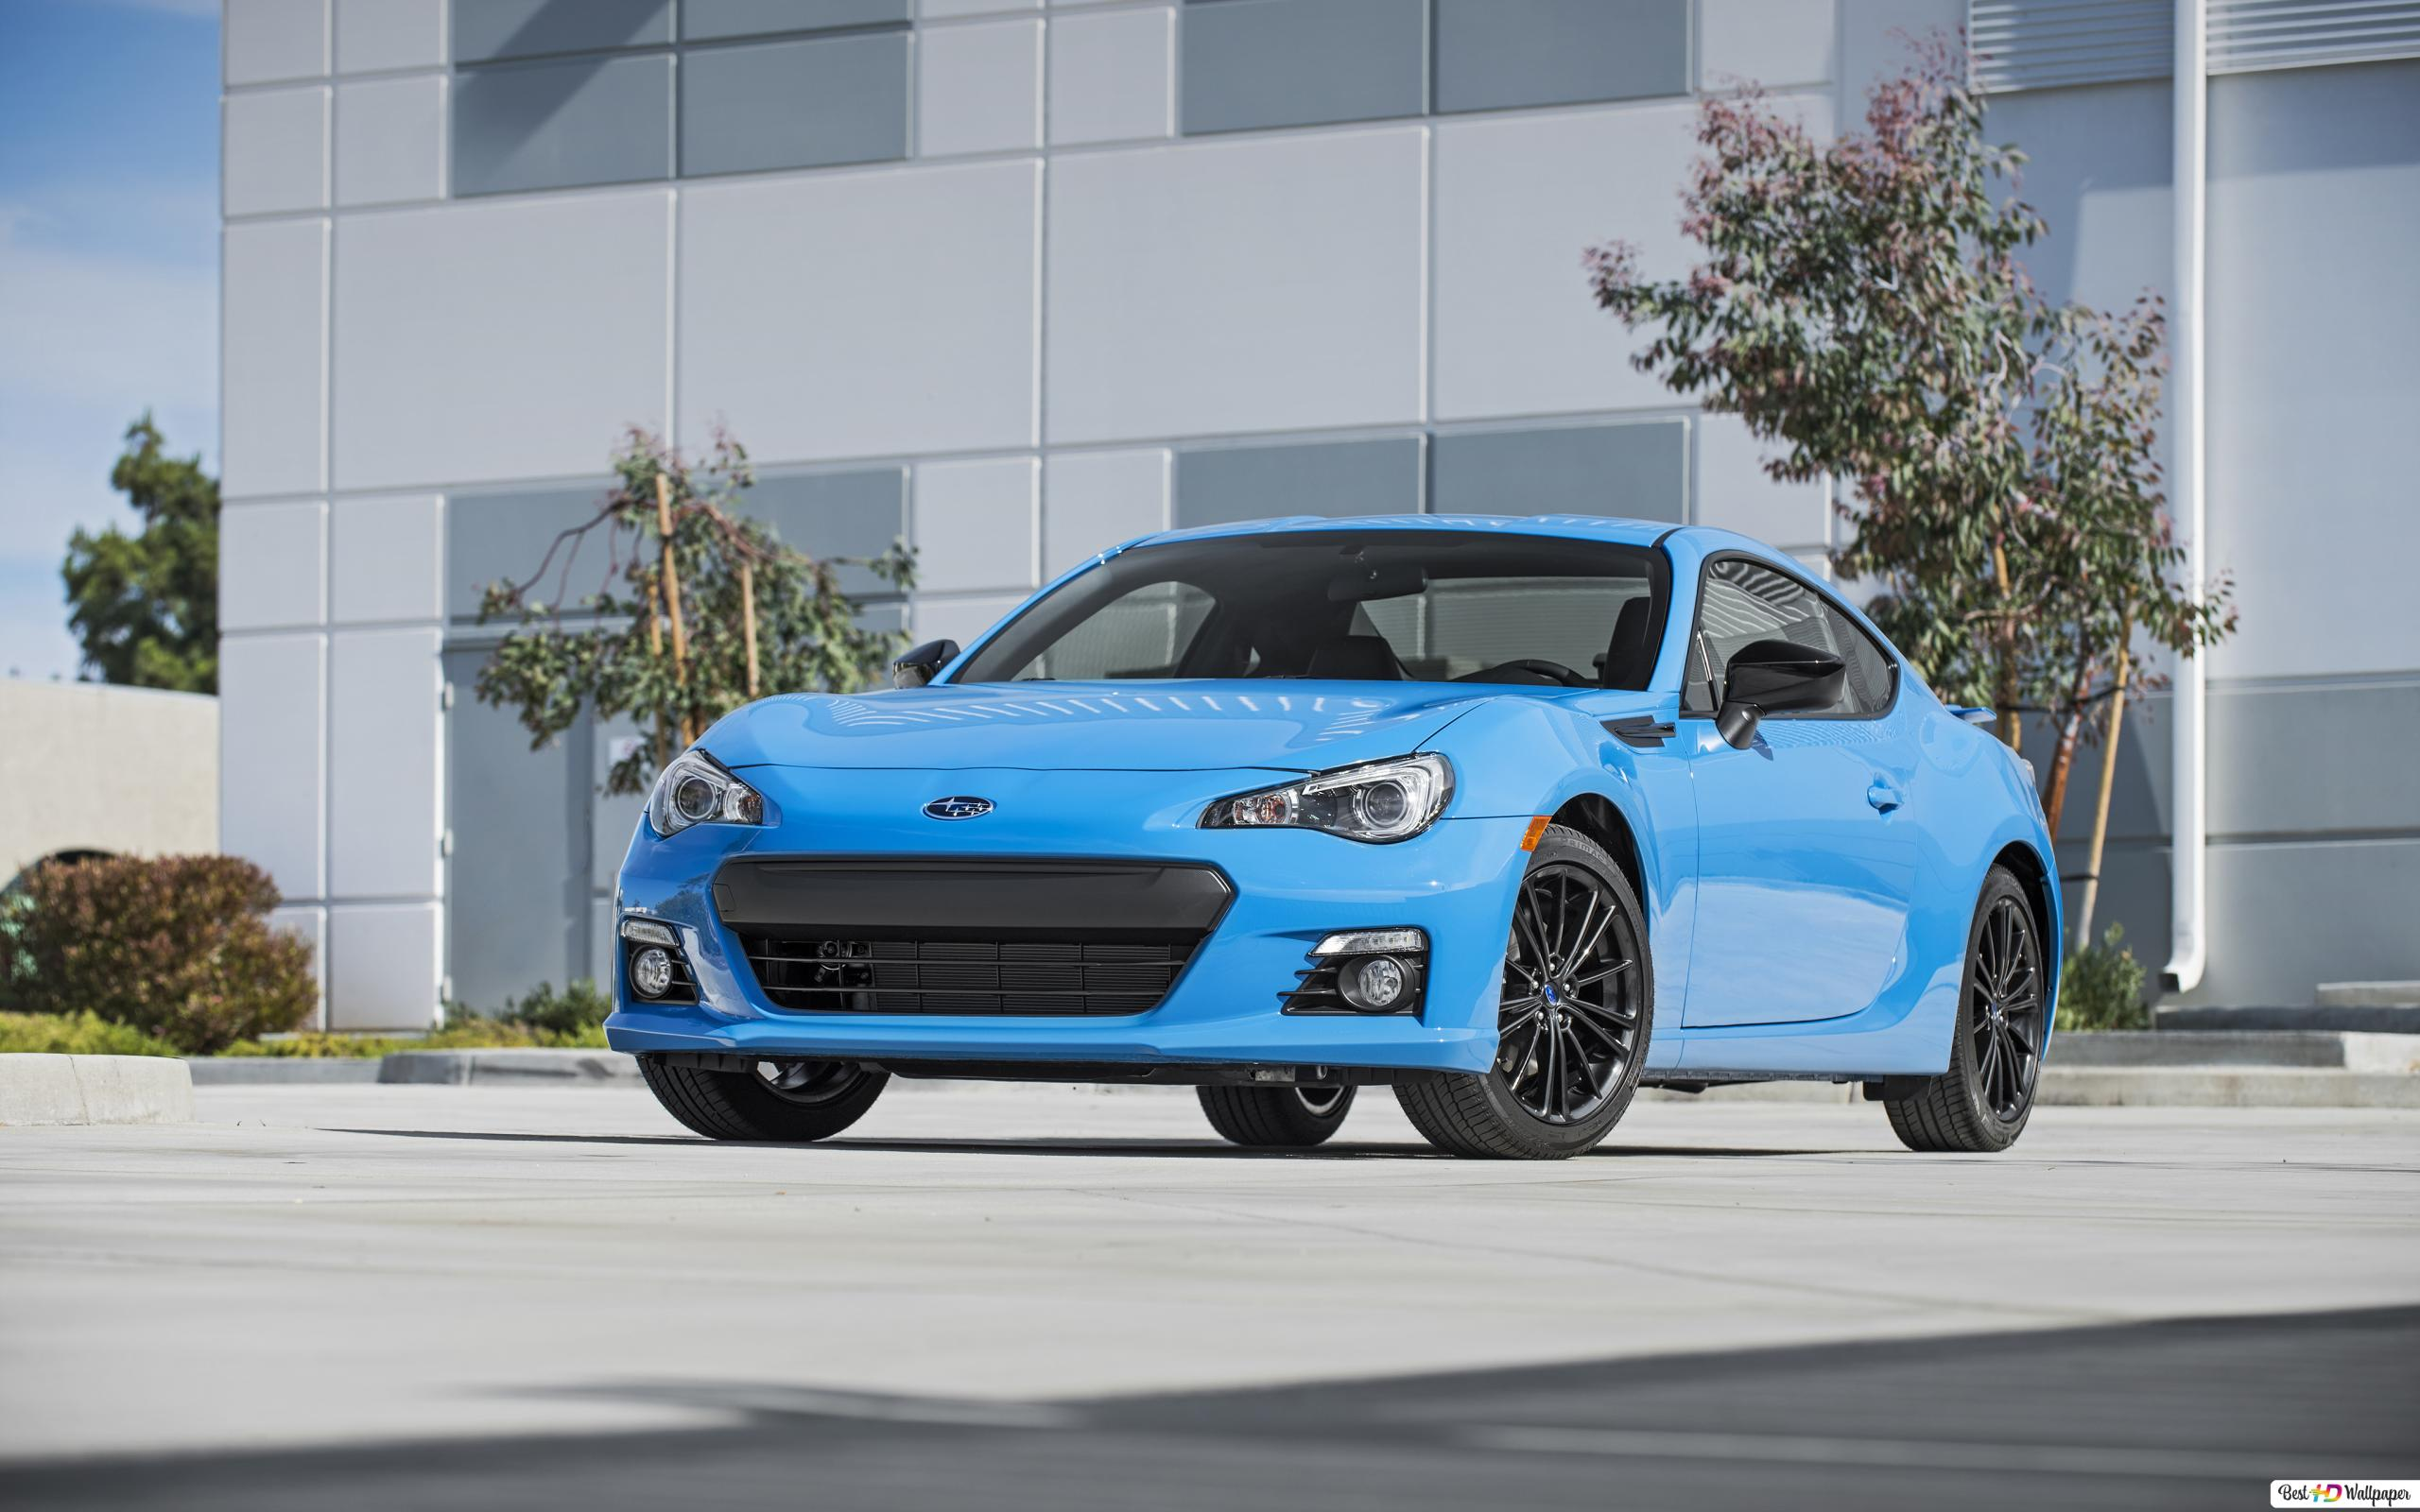 Blue Subaru Brz Sport Car Hd Wallpaper Download